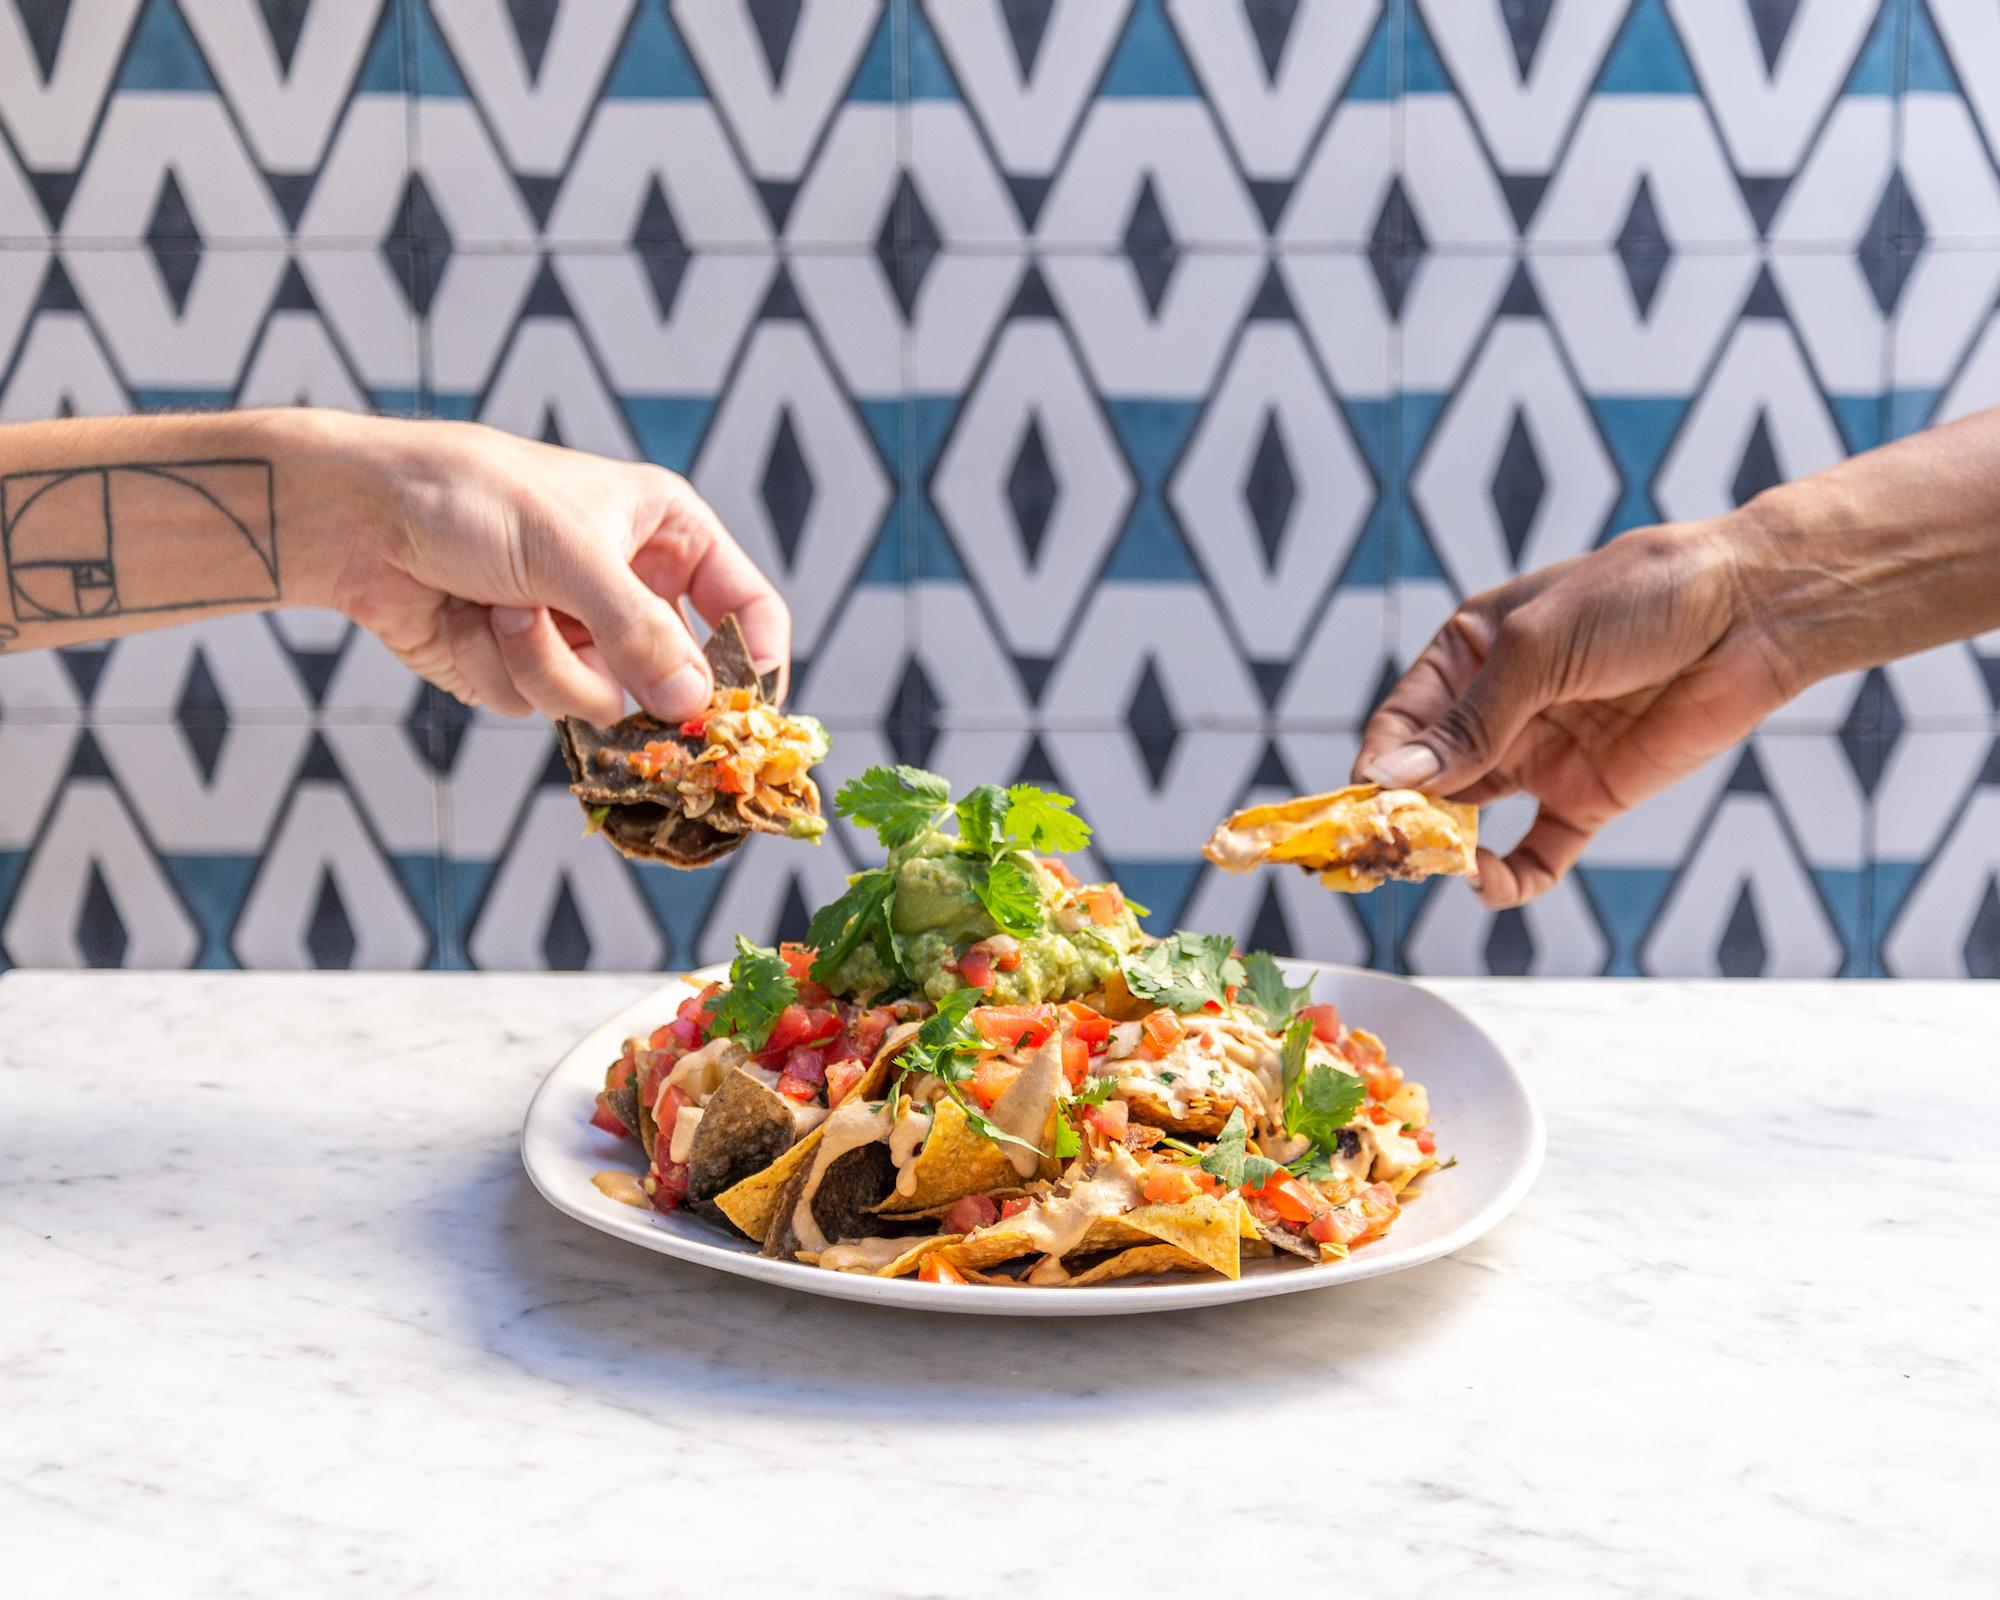 Vegan Mexican Staple Gracias Madre Expands to Newport Beach Tomorrow